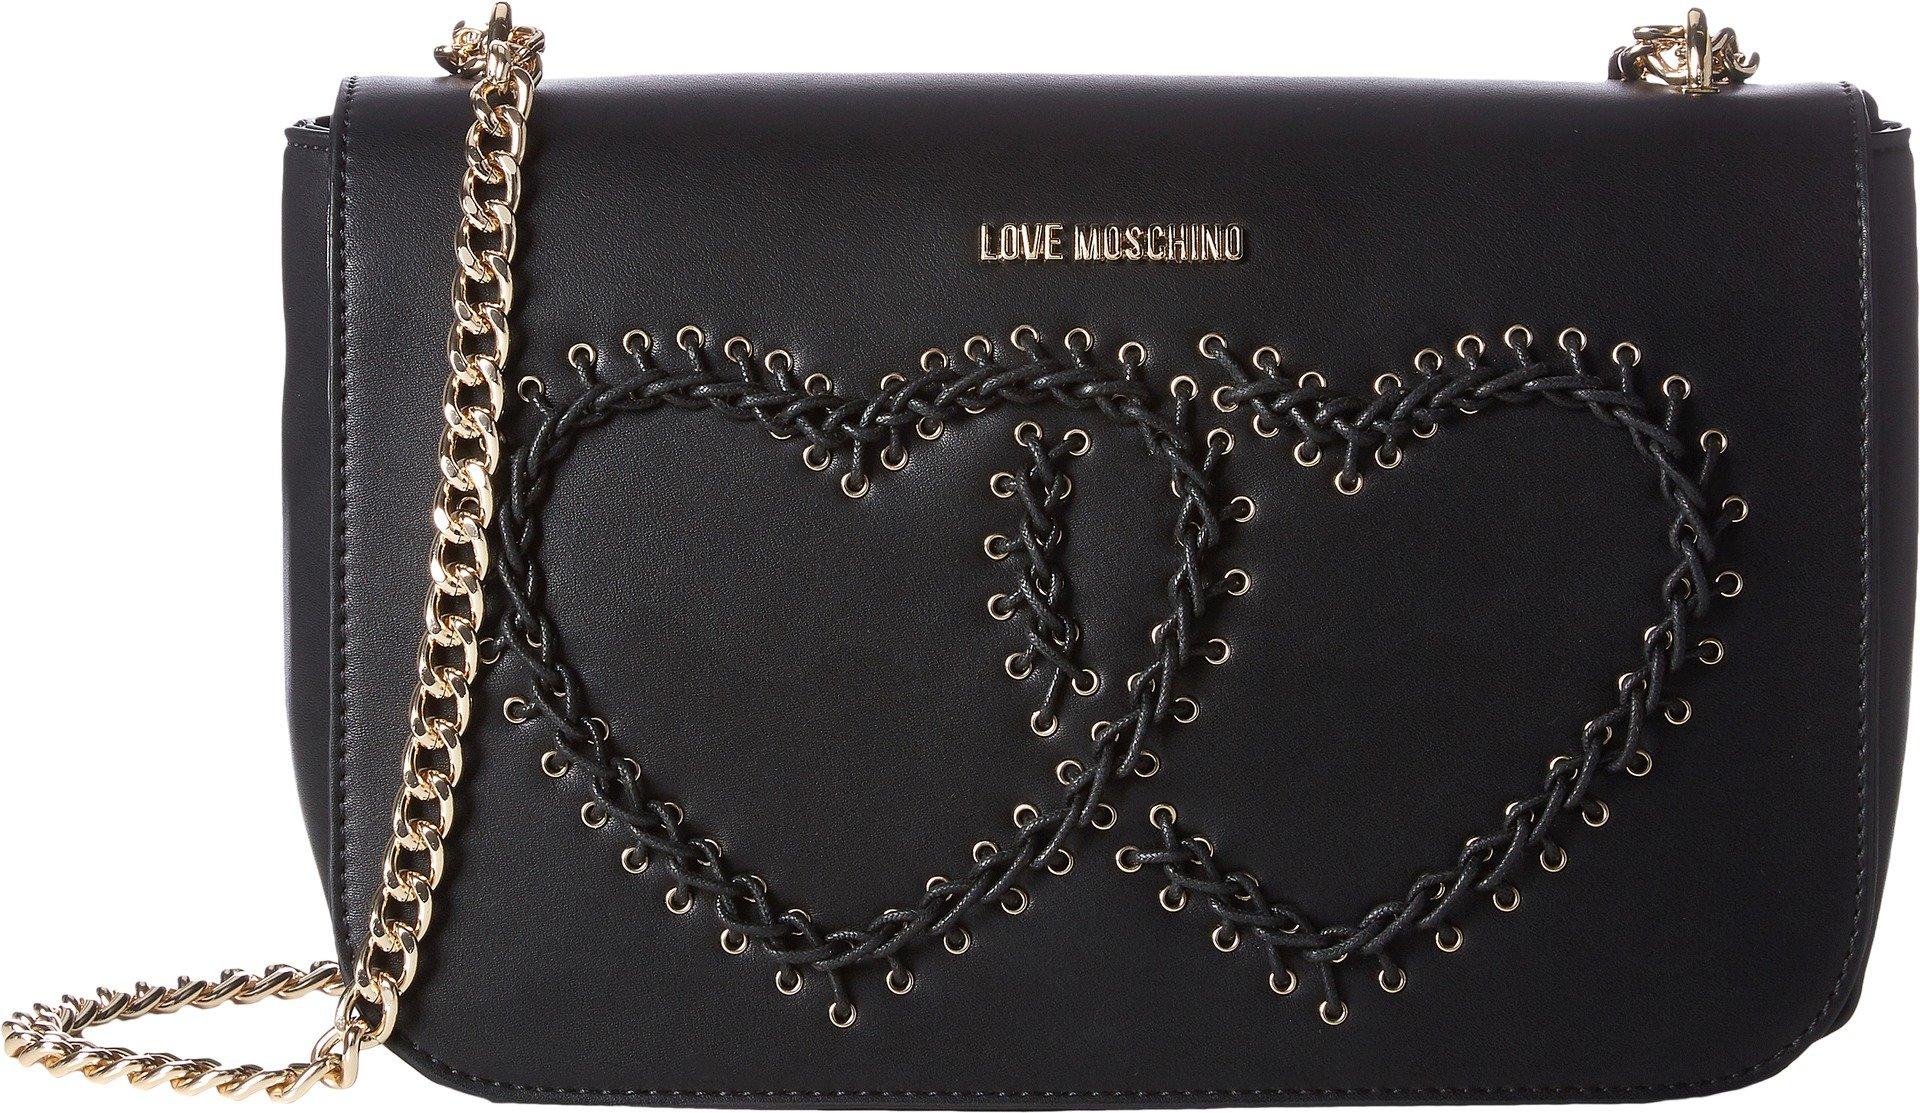 LOVE Moschino Women's Stitched Heart Shoulder Bag Black Handbag